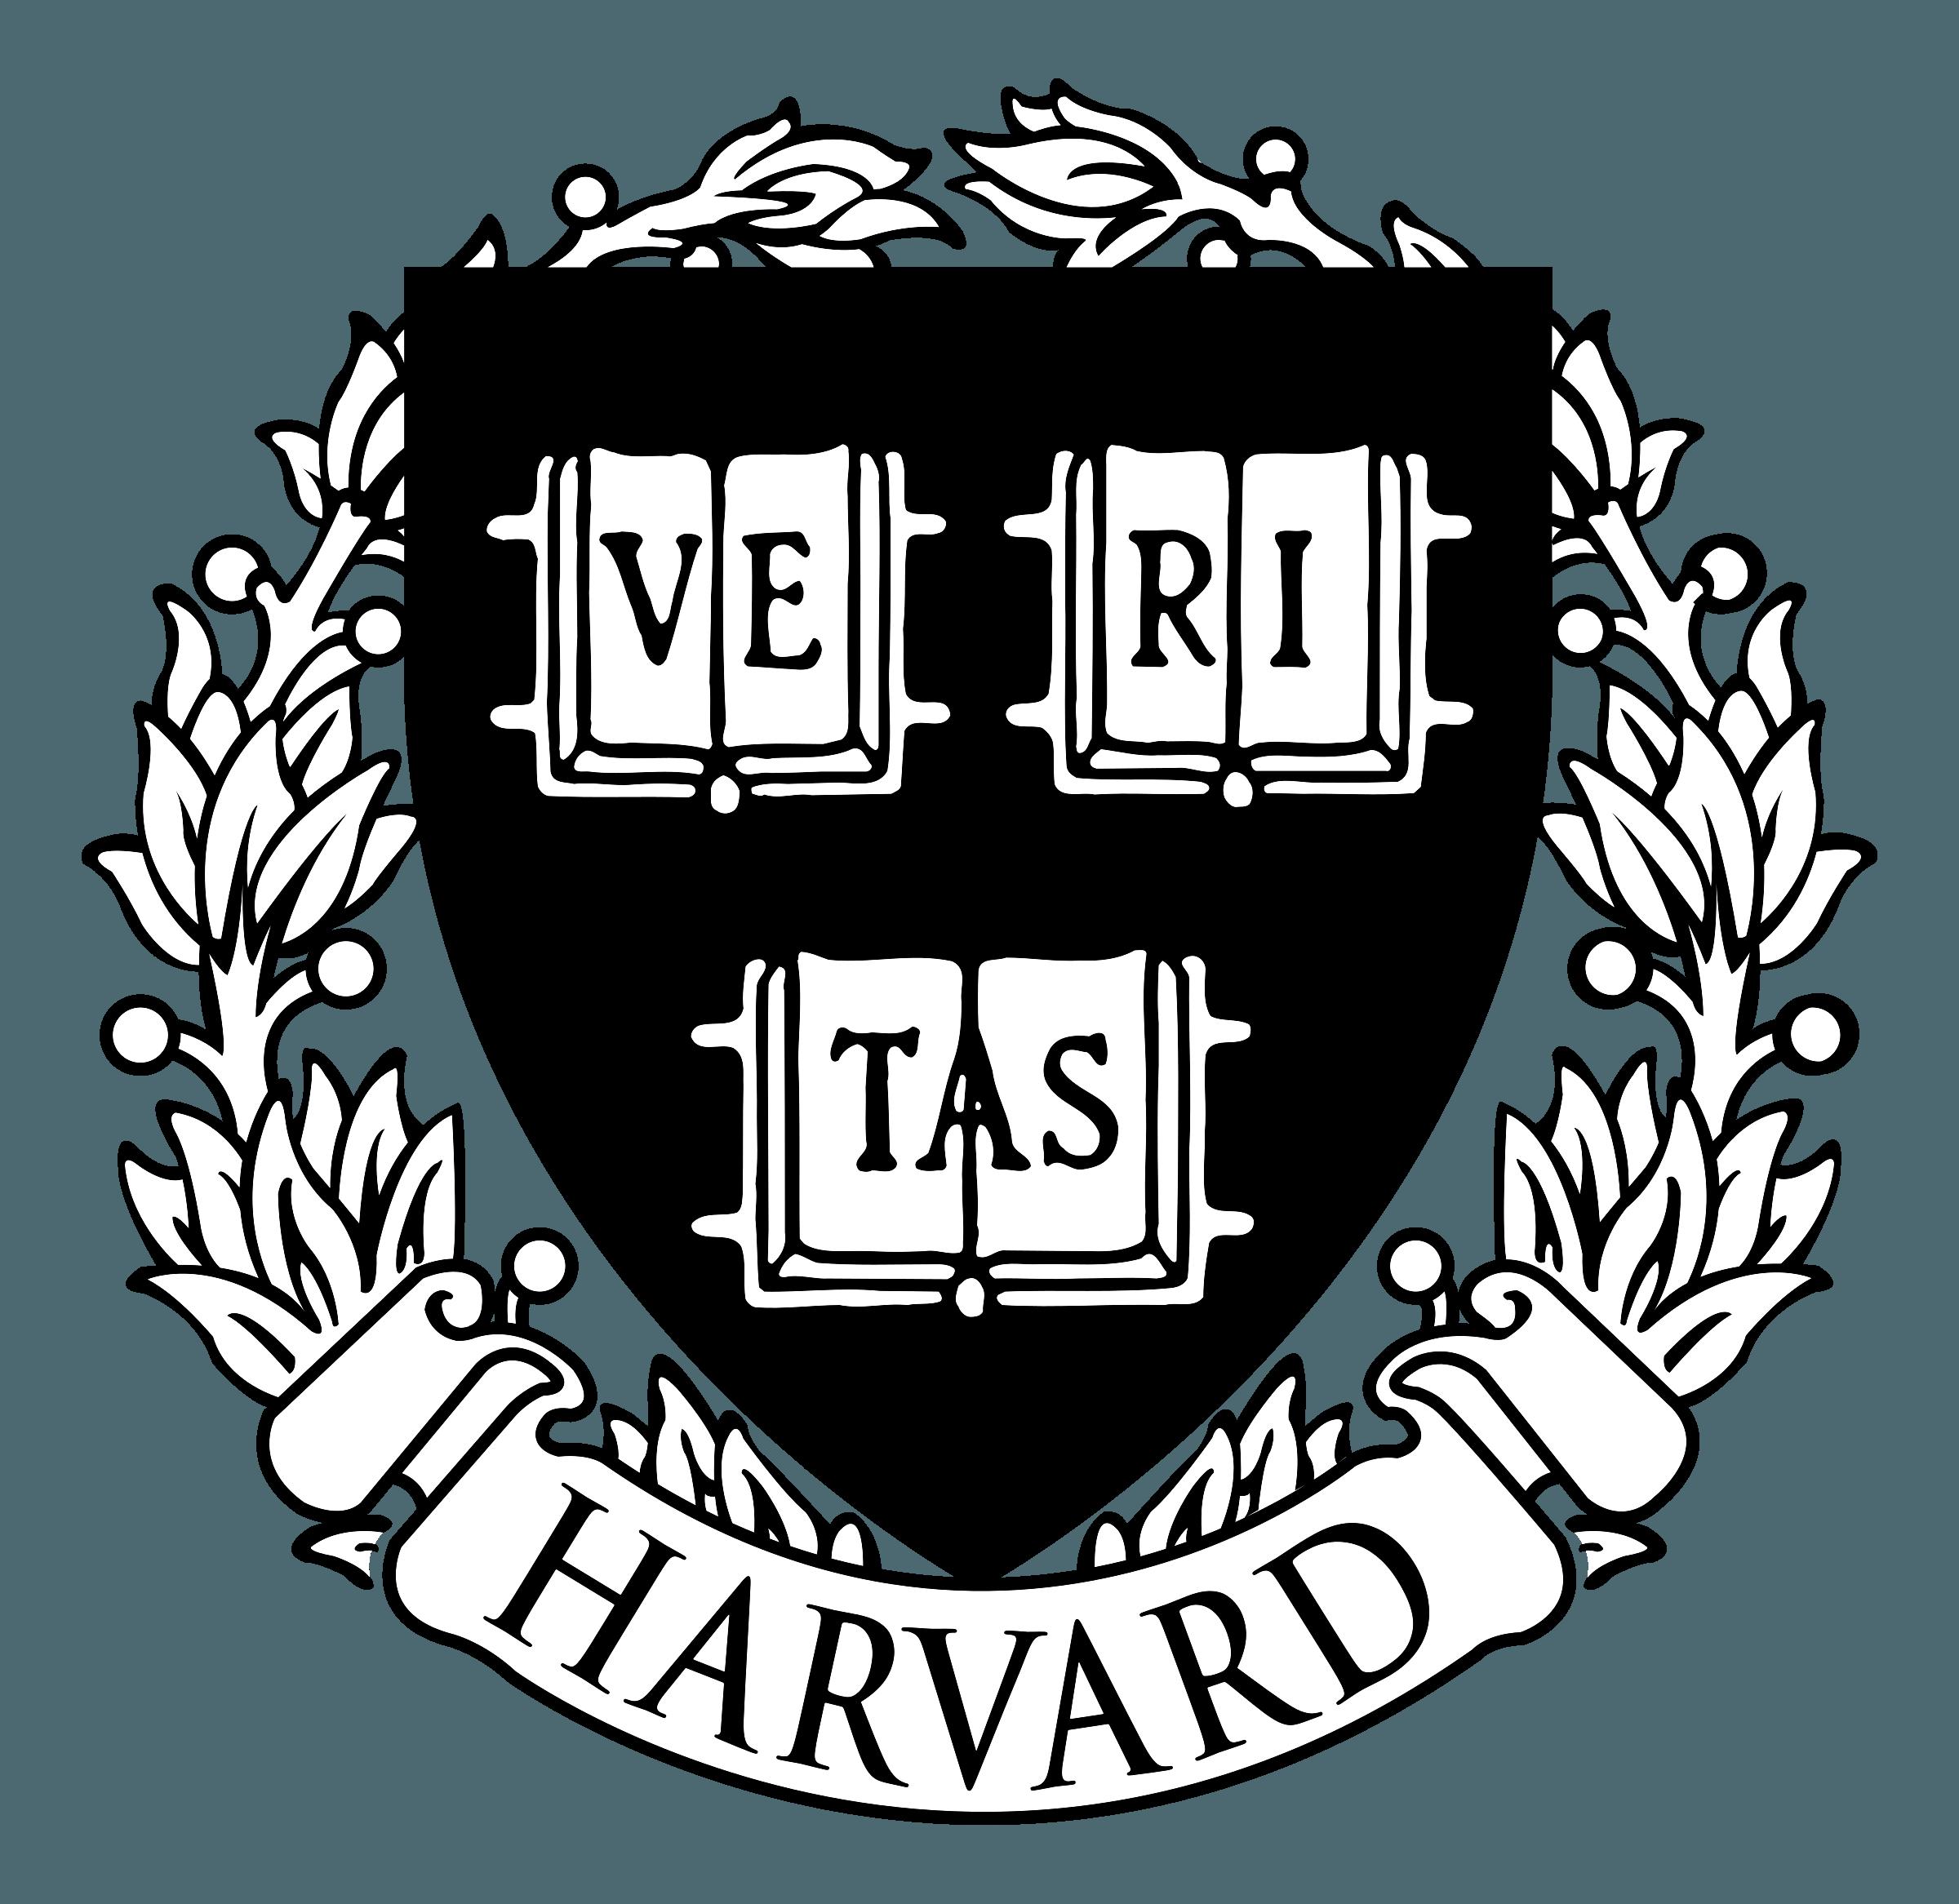 harvard-logo-black-transparent.png